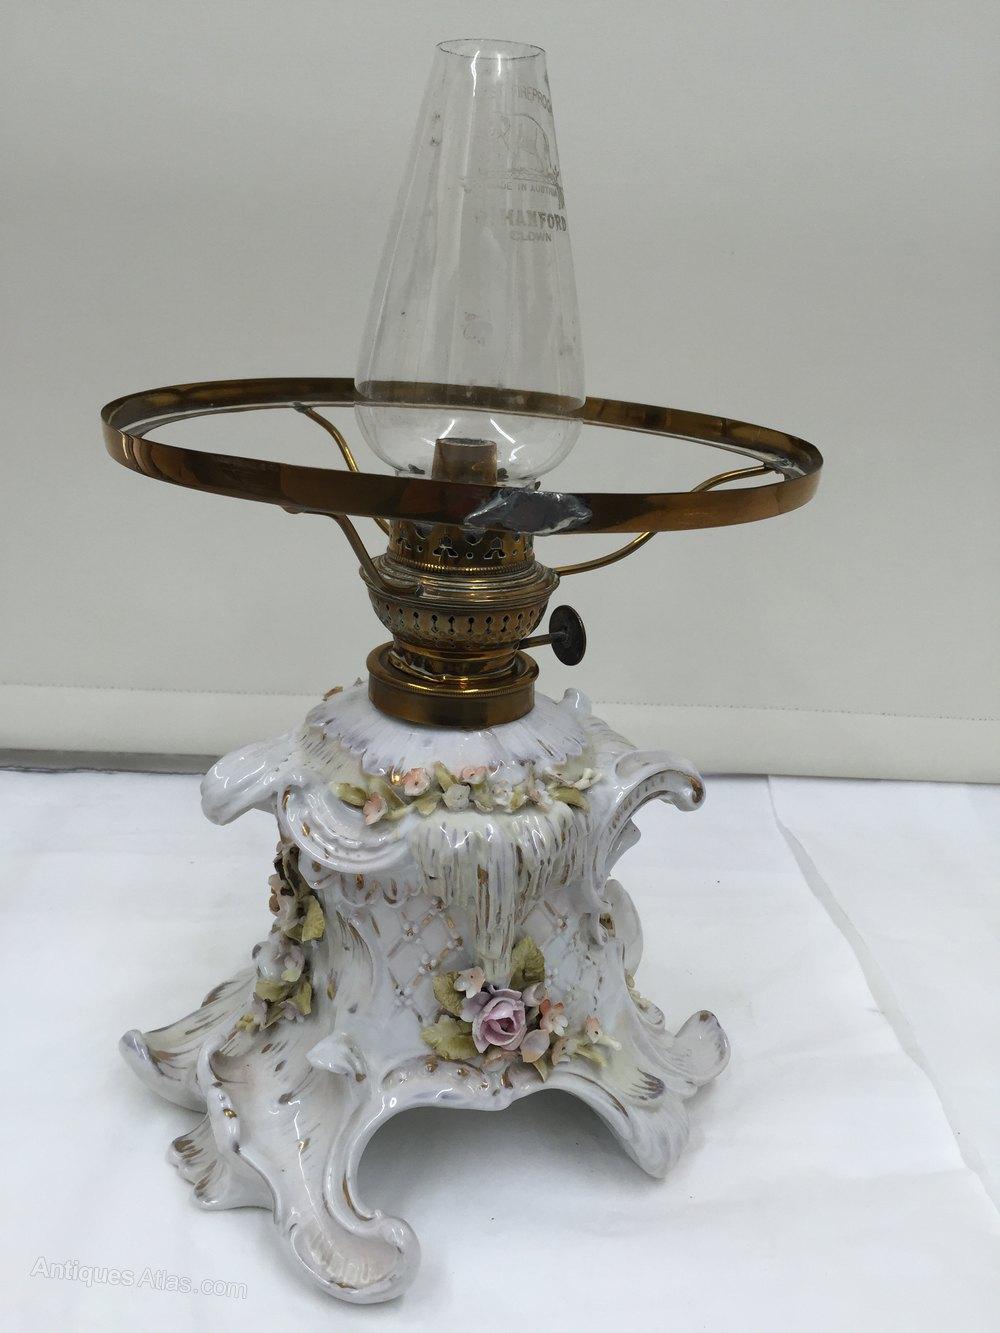 Antiques Atlas Volkdstet Porcelain Oil Lamp Circa 1870